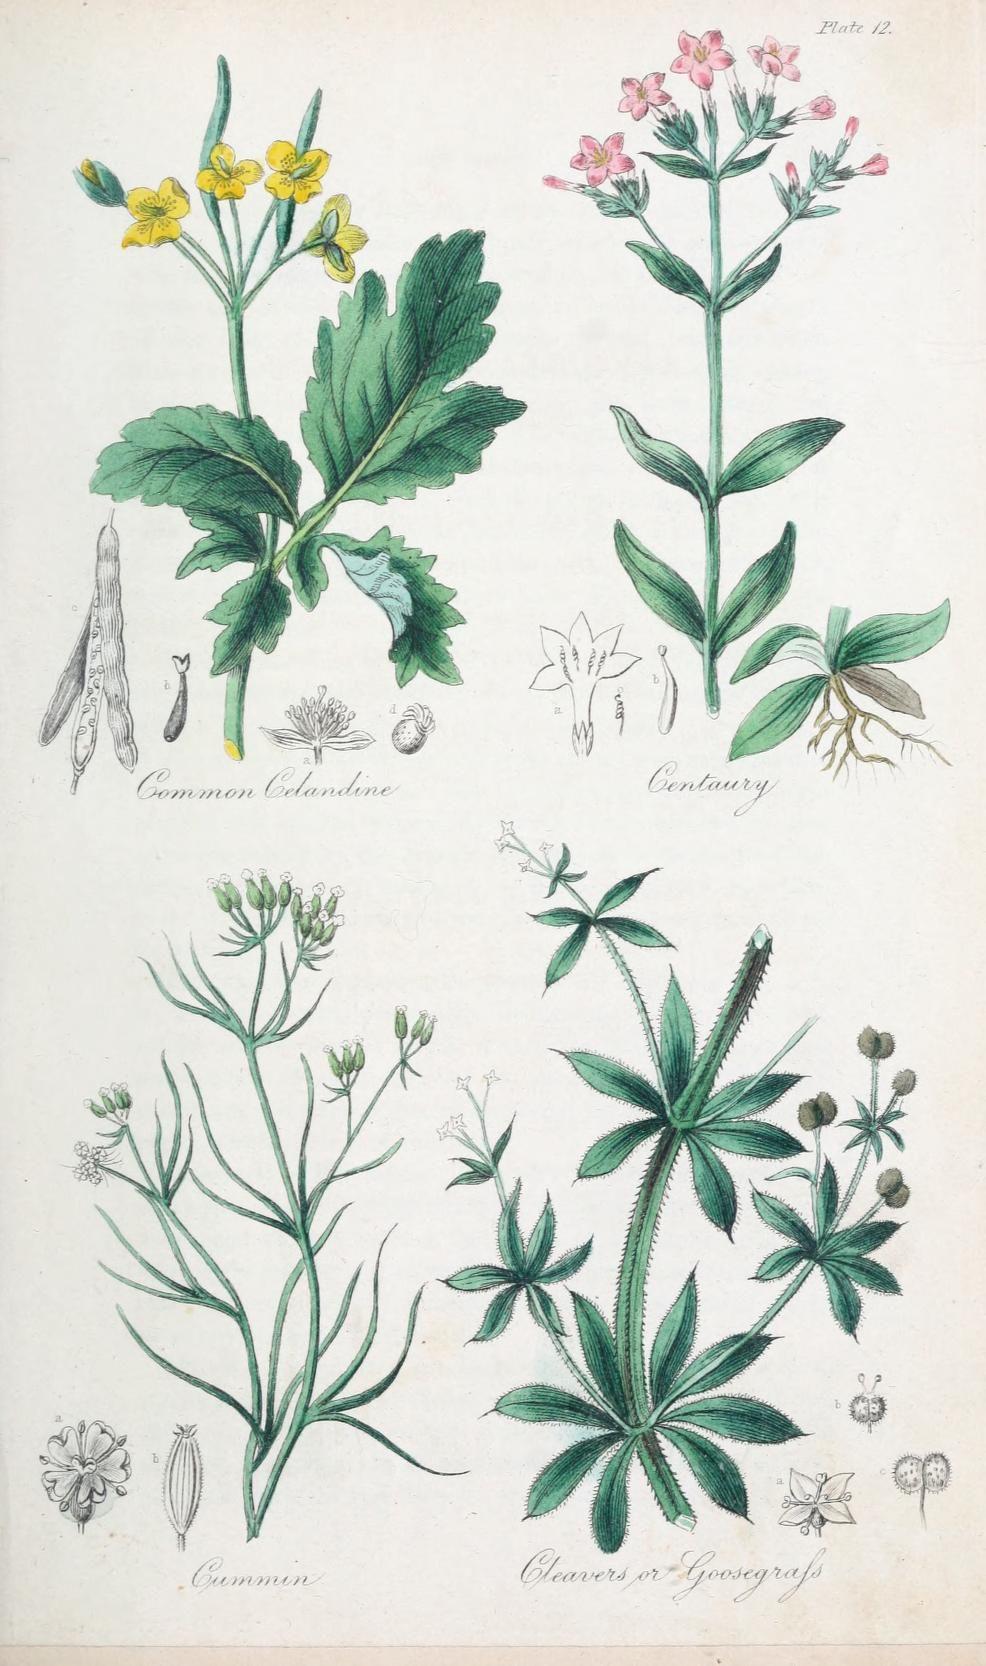 Jardin Botanique Best Of 1 the British Flora Medica or History Of the Medicinal